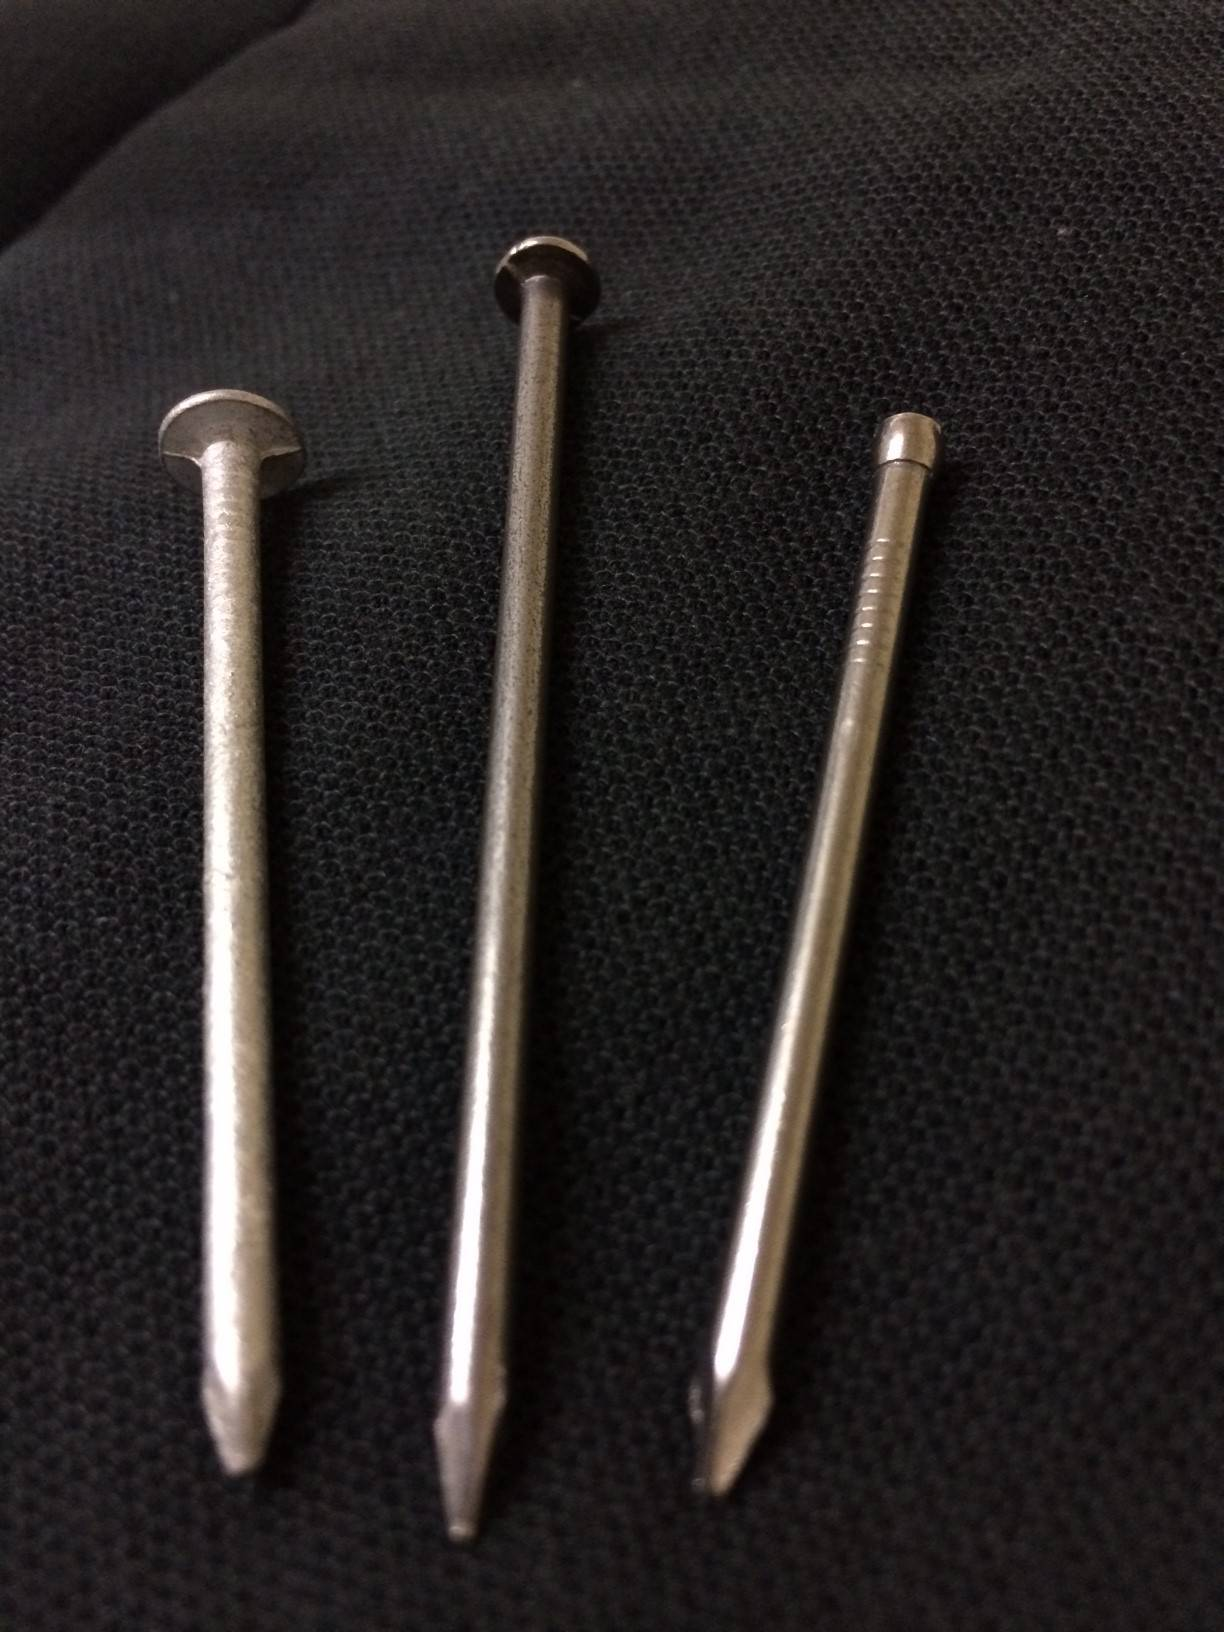 Screws vs. Nails